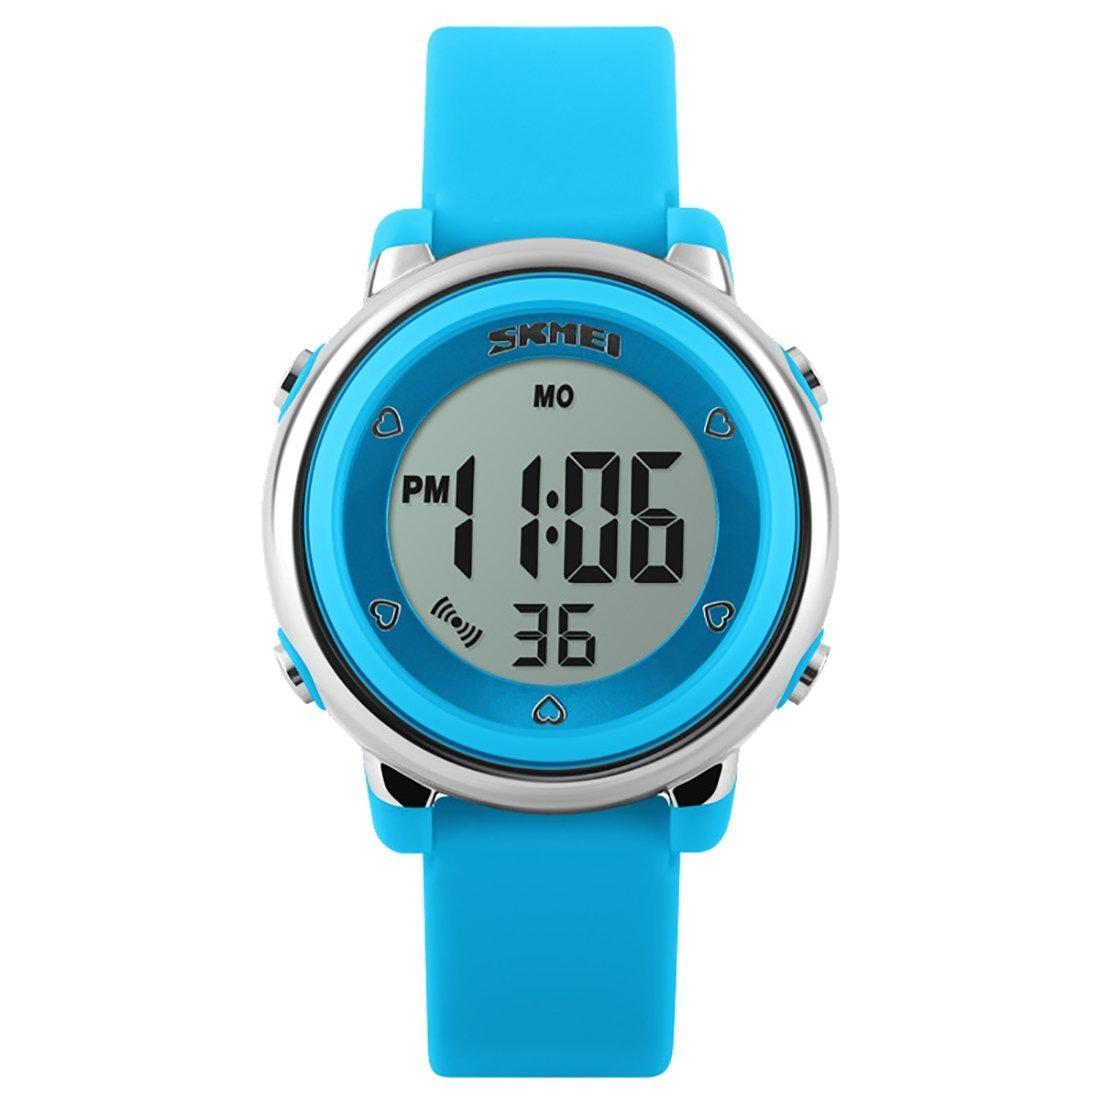 Kid Watch Multi Function 50M Water Resistant Sport LED Alarm Stopwatch Digital Child Wristwatch (Light Blue)